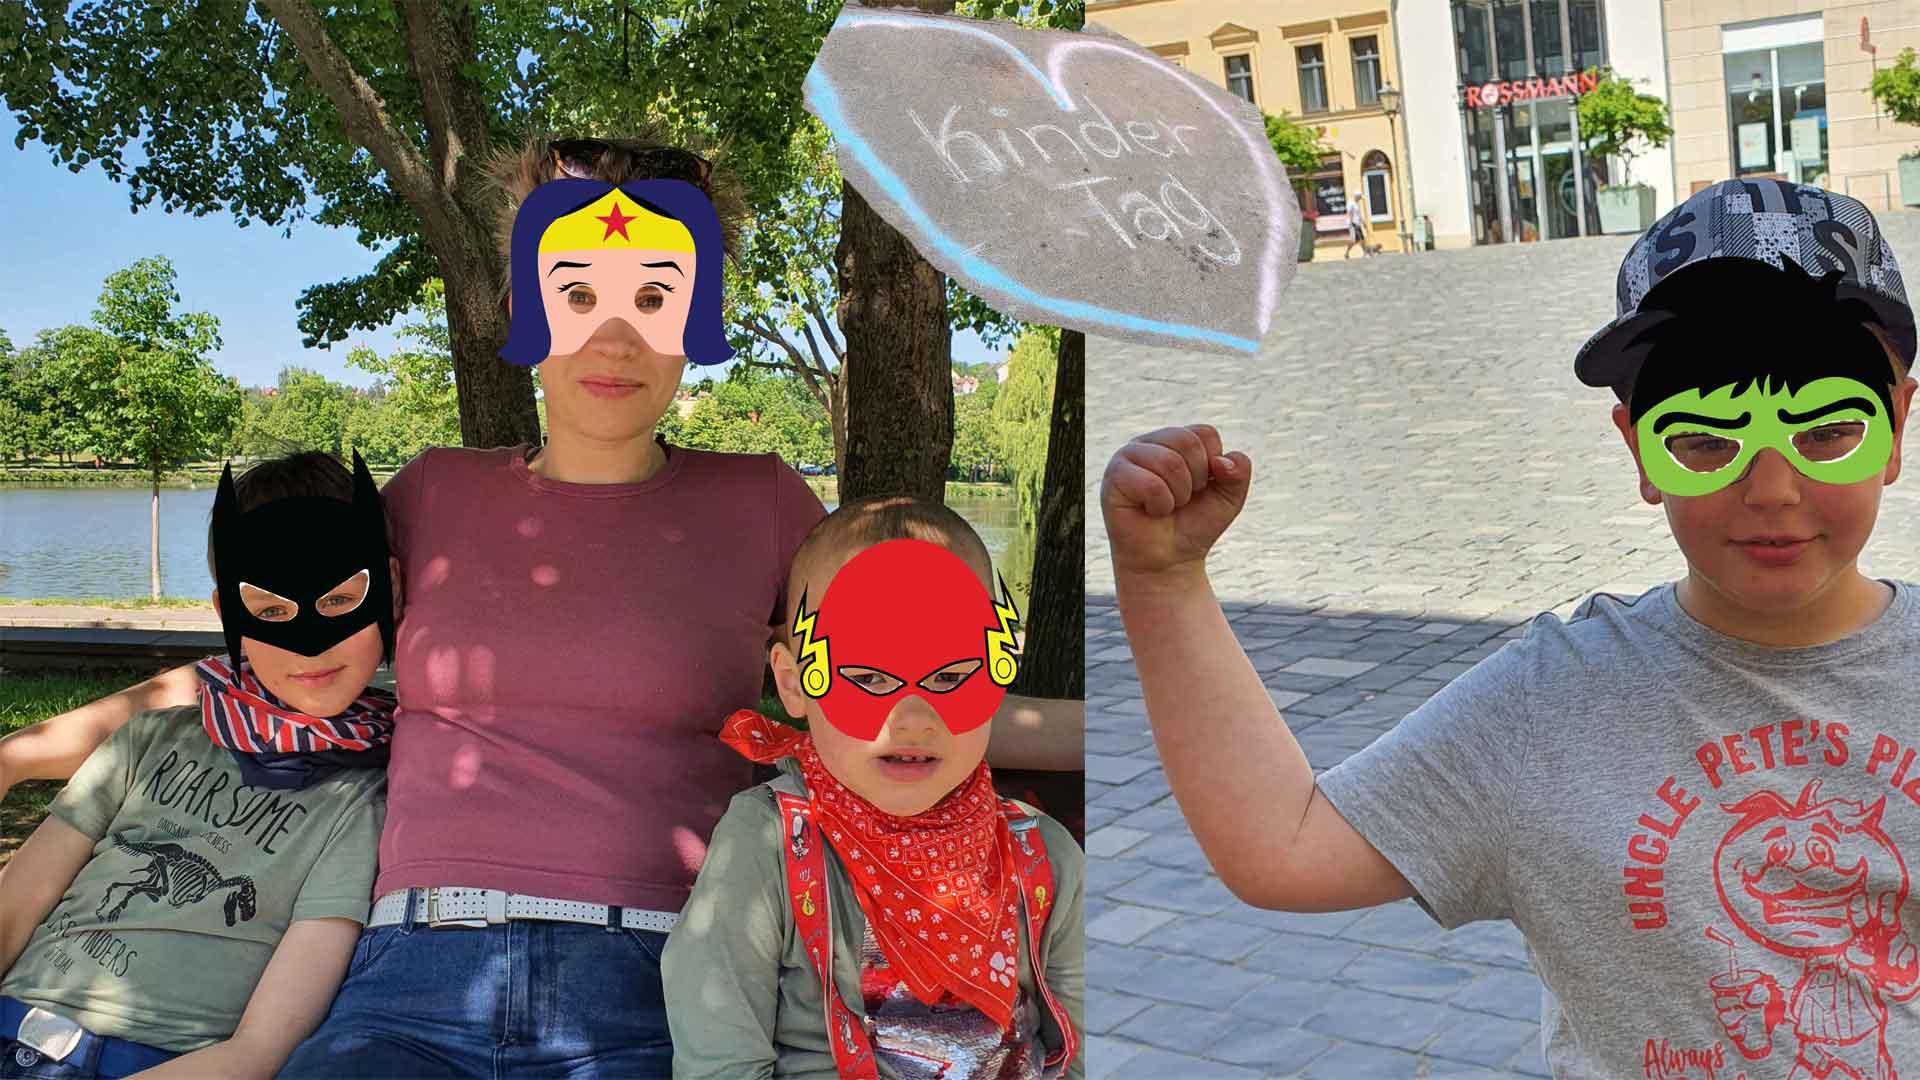 Superhelden am Kindertag, Fotos: Maike Steuer